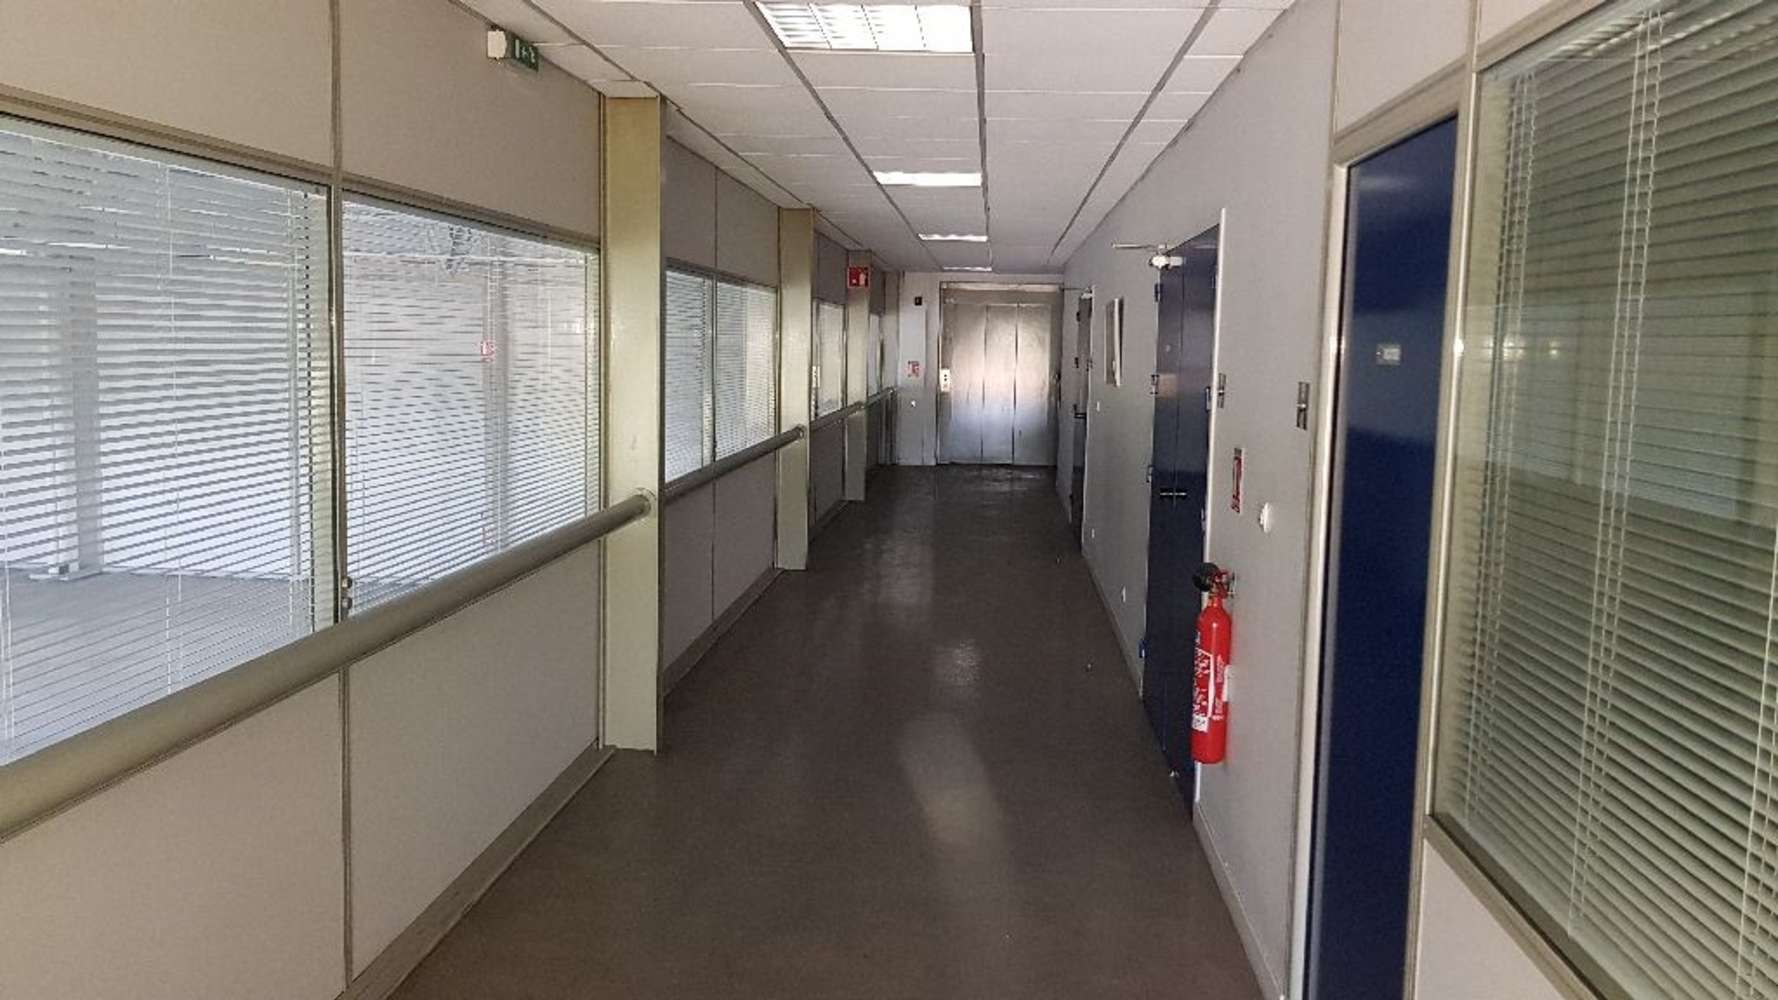 Activités/entrepôt Vaulx milieu, 38090 - Entrepot à vendre Lyon - Vaulx Milieu - 9873750